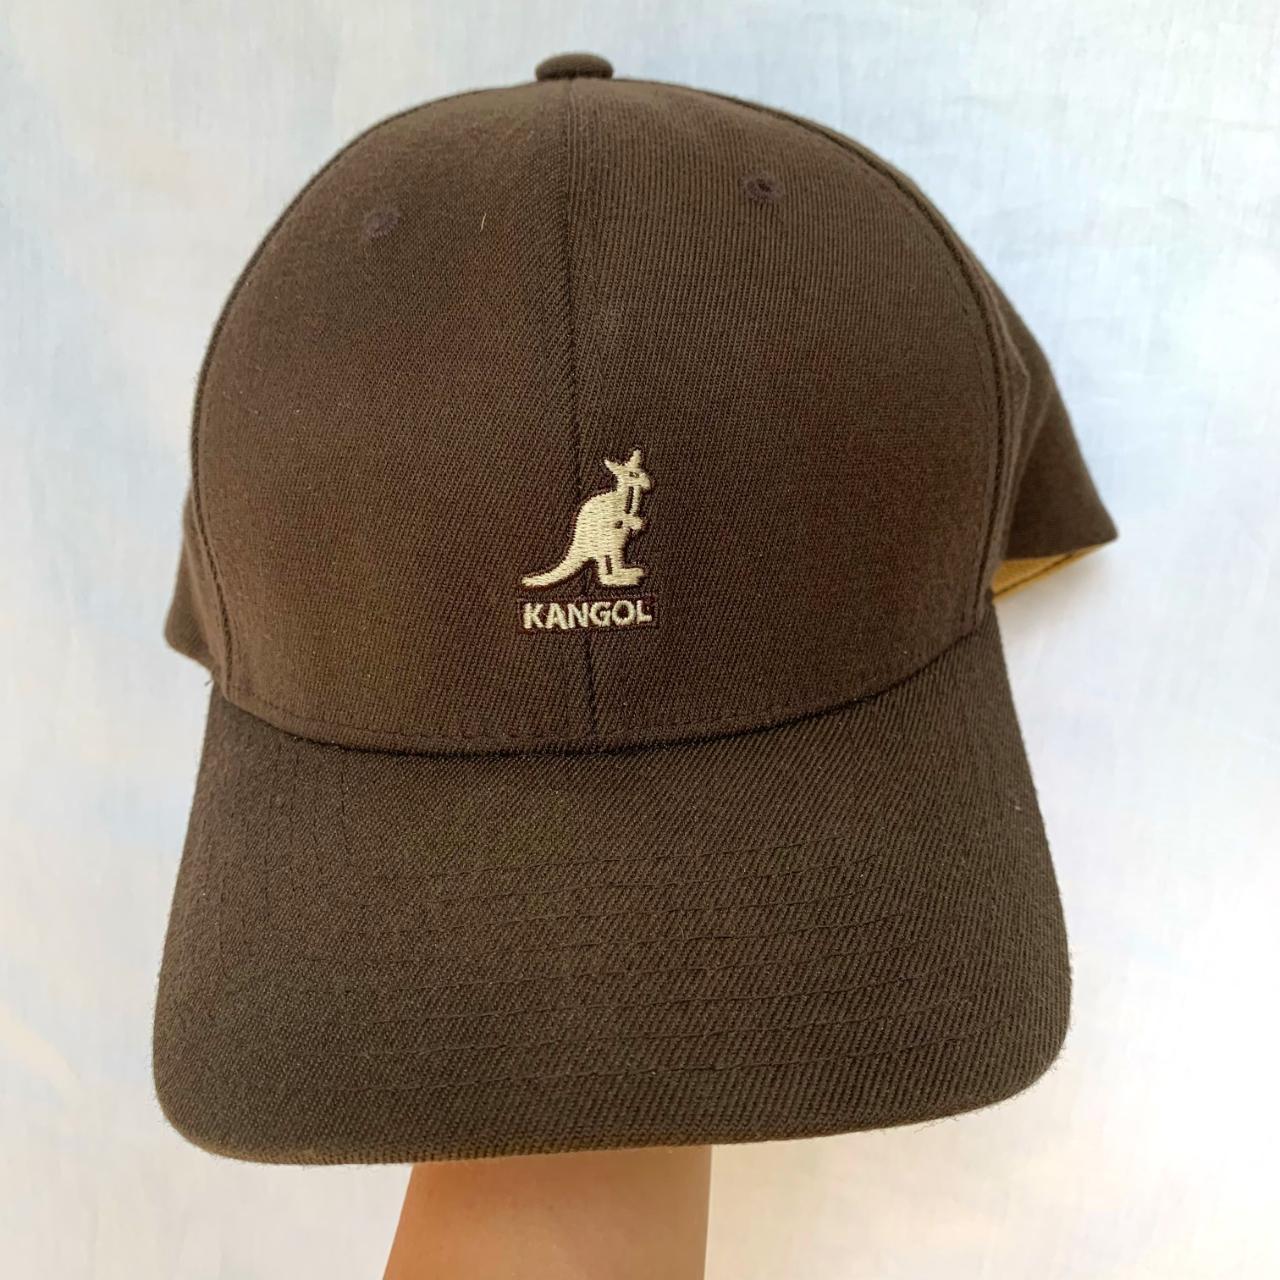 Product Image 1 - Kangol Brown Baseball Hat  Size